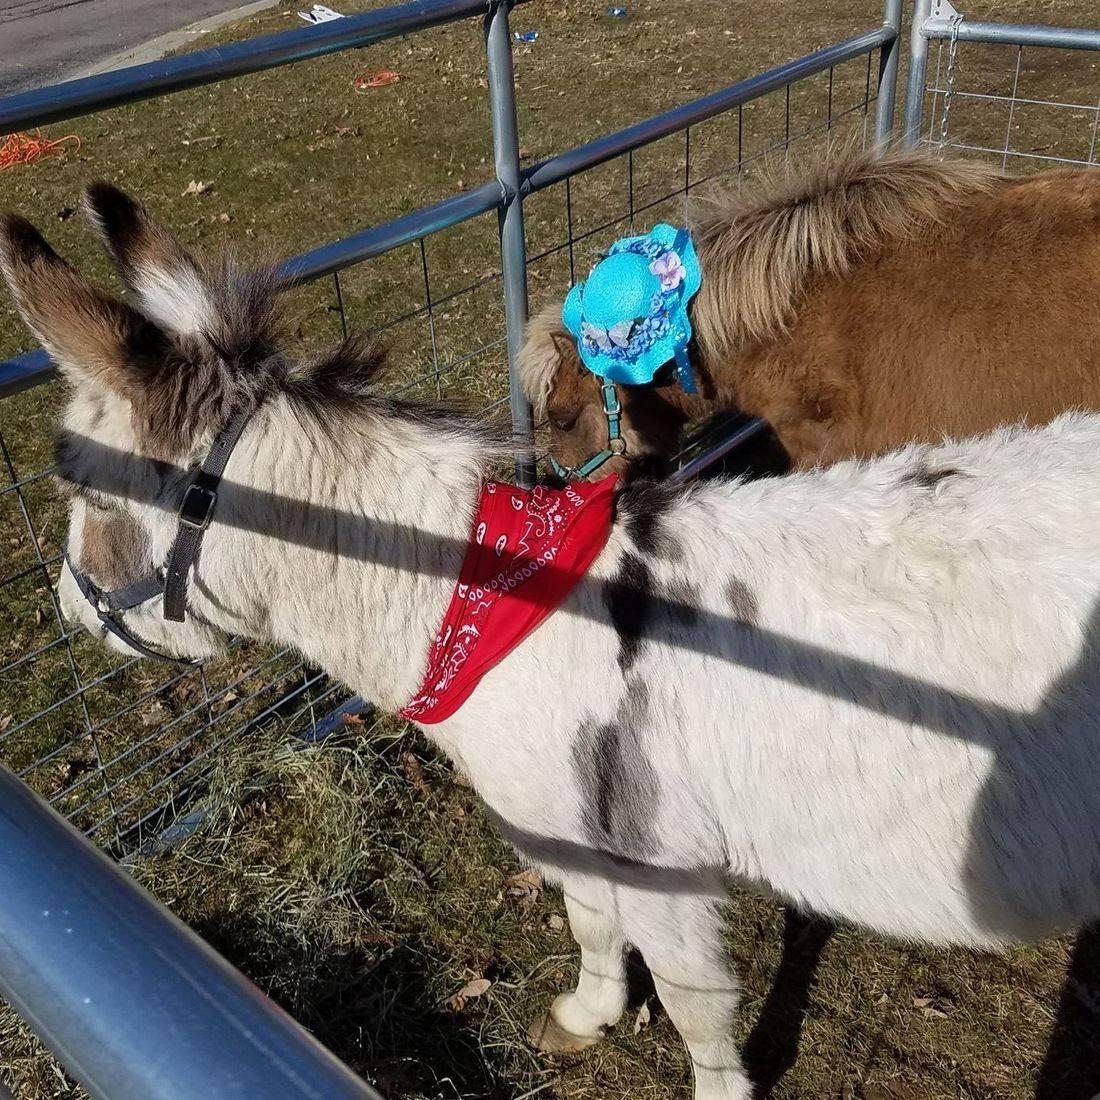 Donkey and mini horse in petting farm